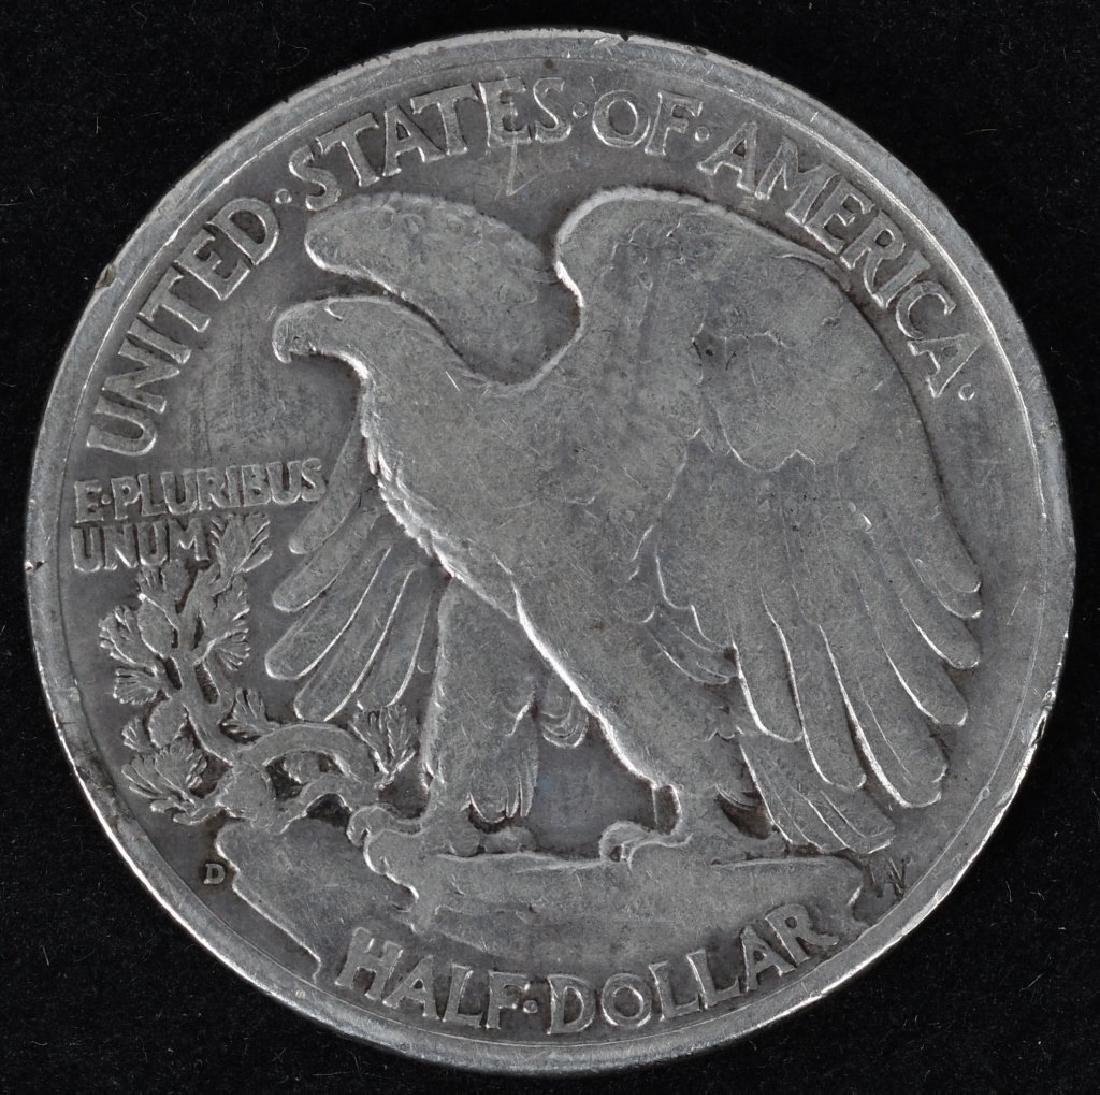 1921 P & S, 1938-D WALKING LIBERTY HALF DOLLARS - 5